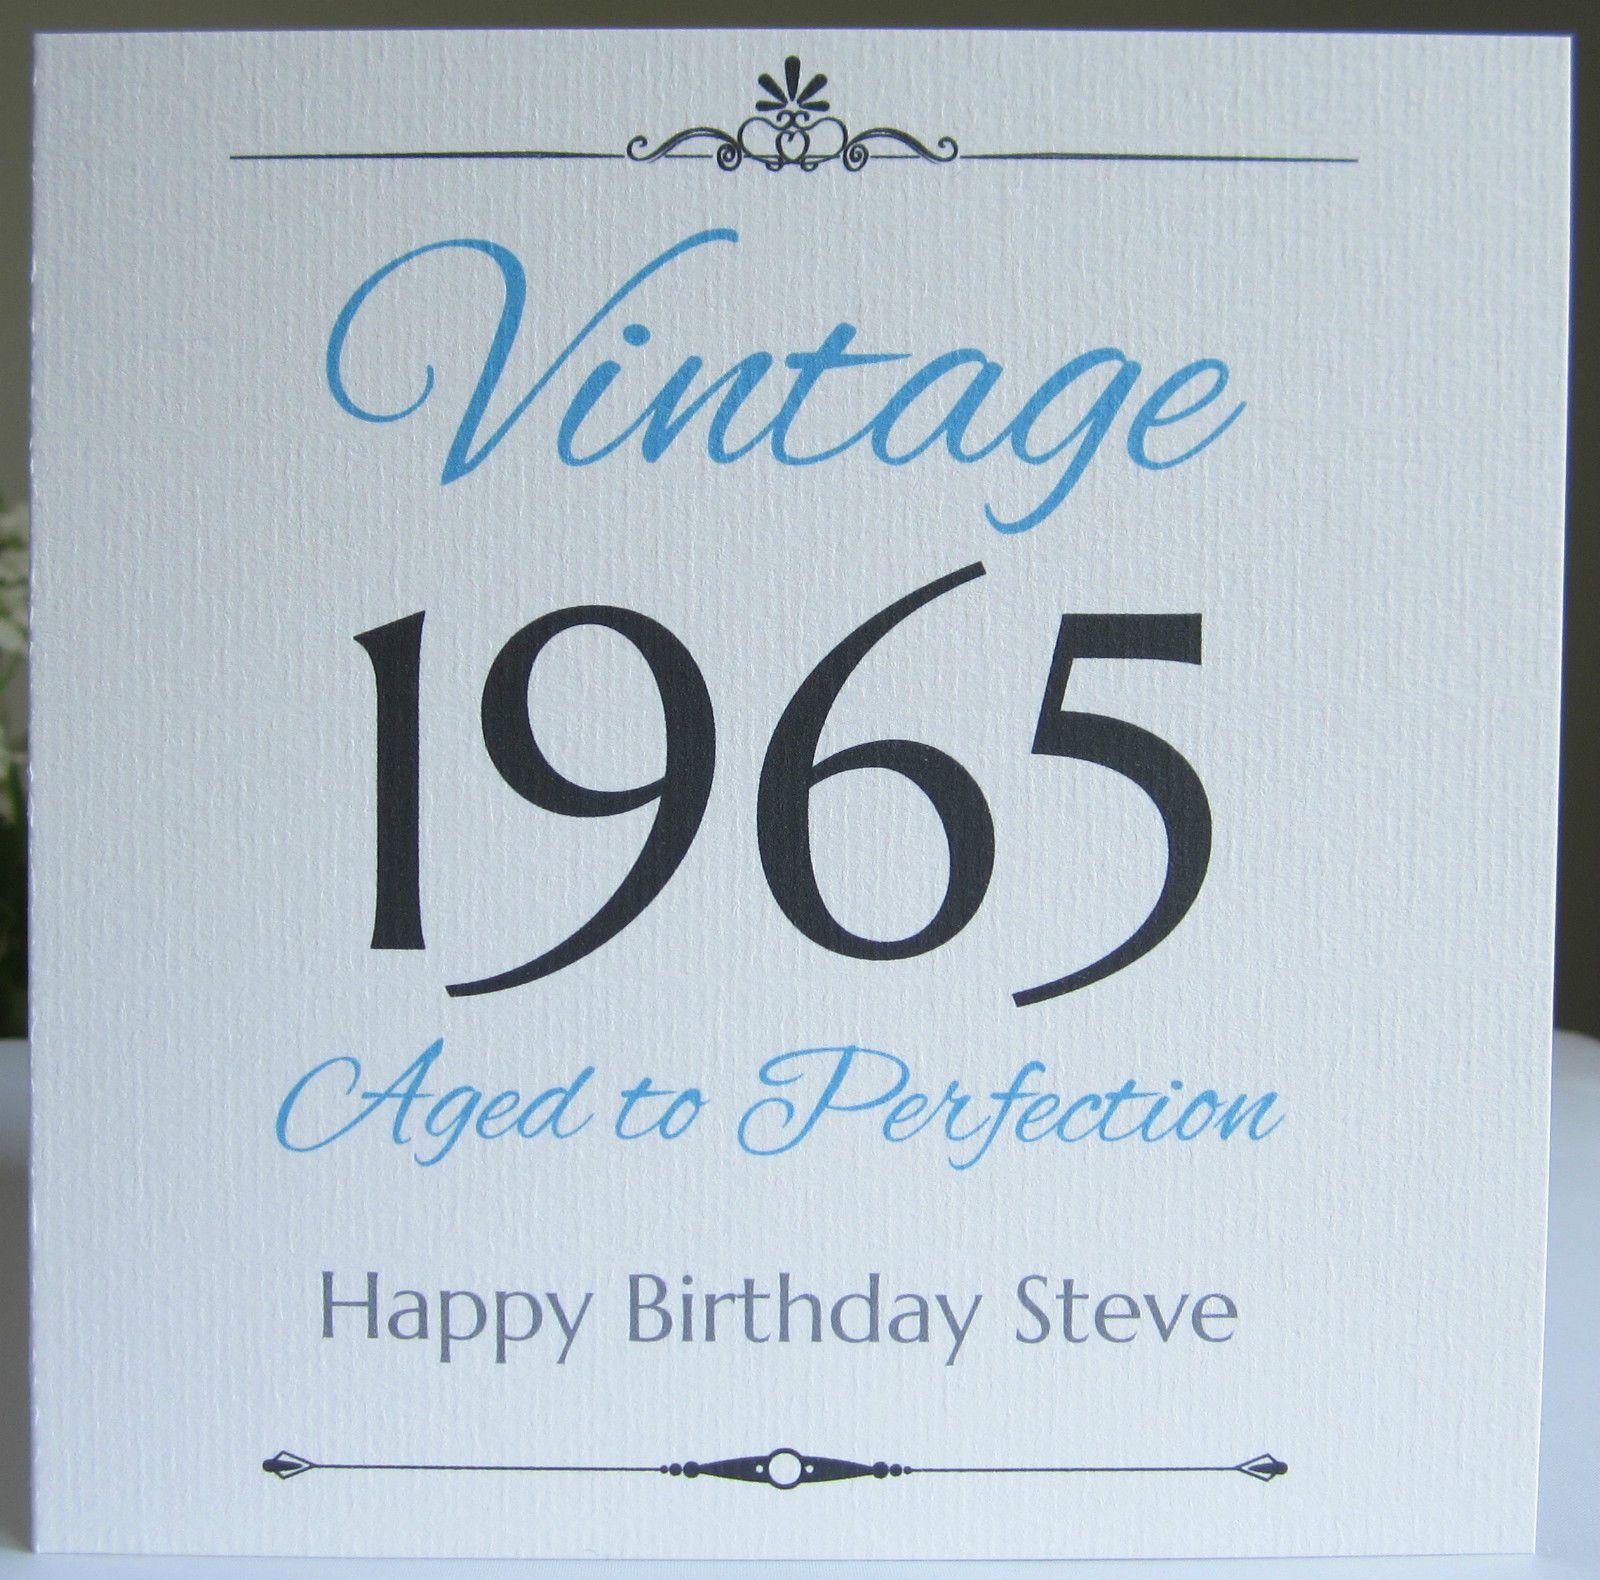 Personalised Handmade Birthday Card Male Men 40th 50th 60th 70th 80th Any Year Birthday Cards For Men 50th Birthday Cards Birthday Cards For Him